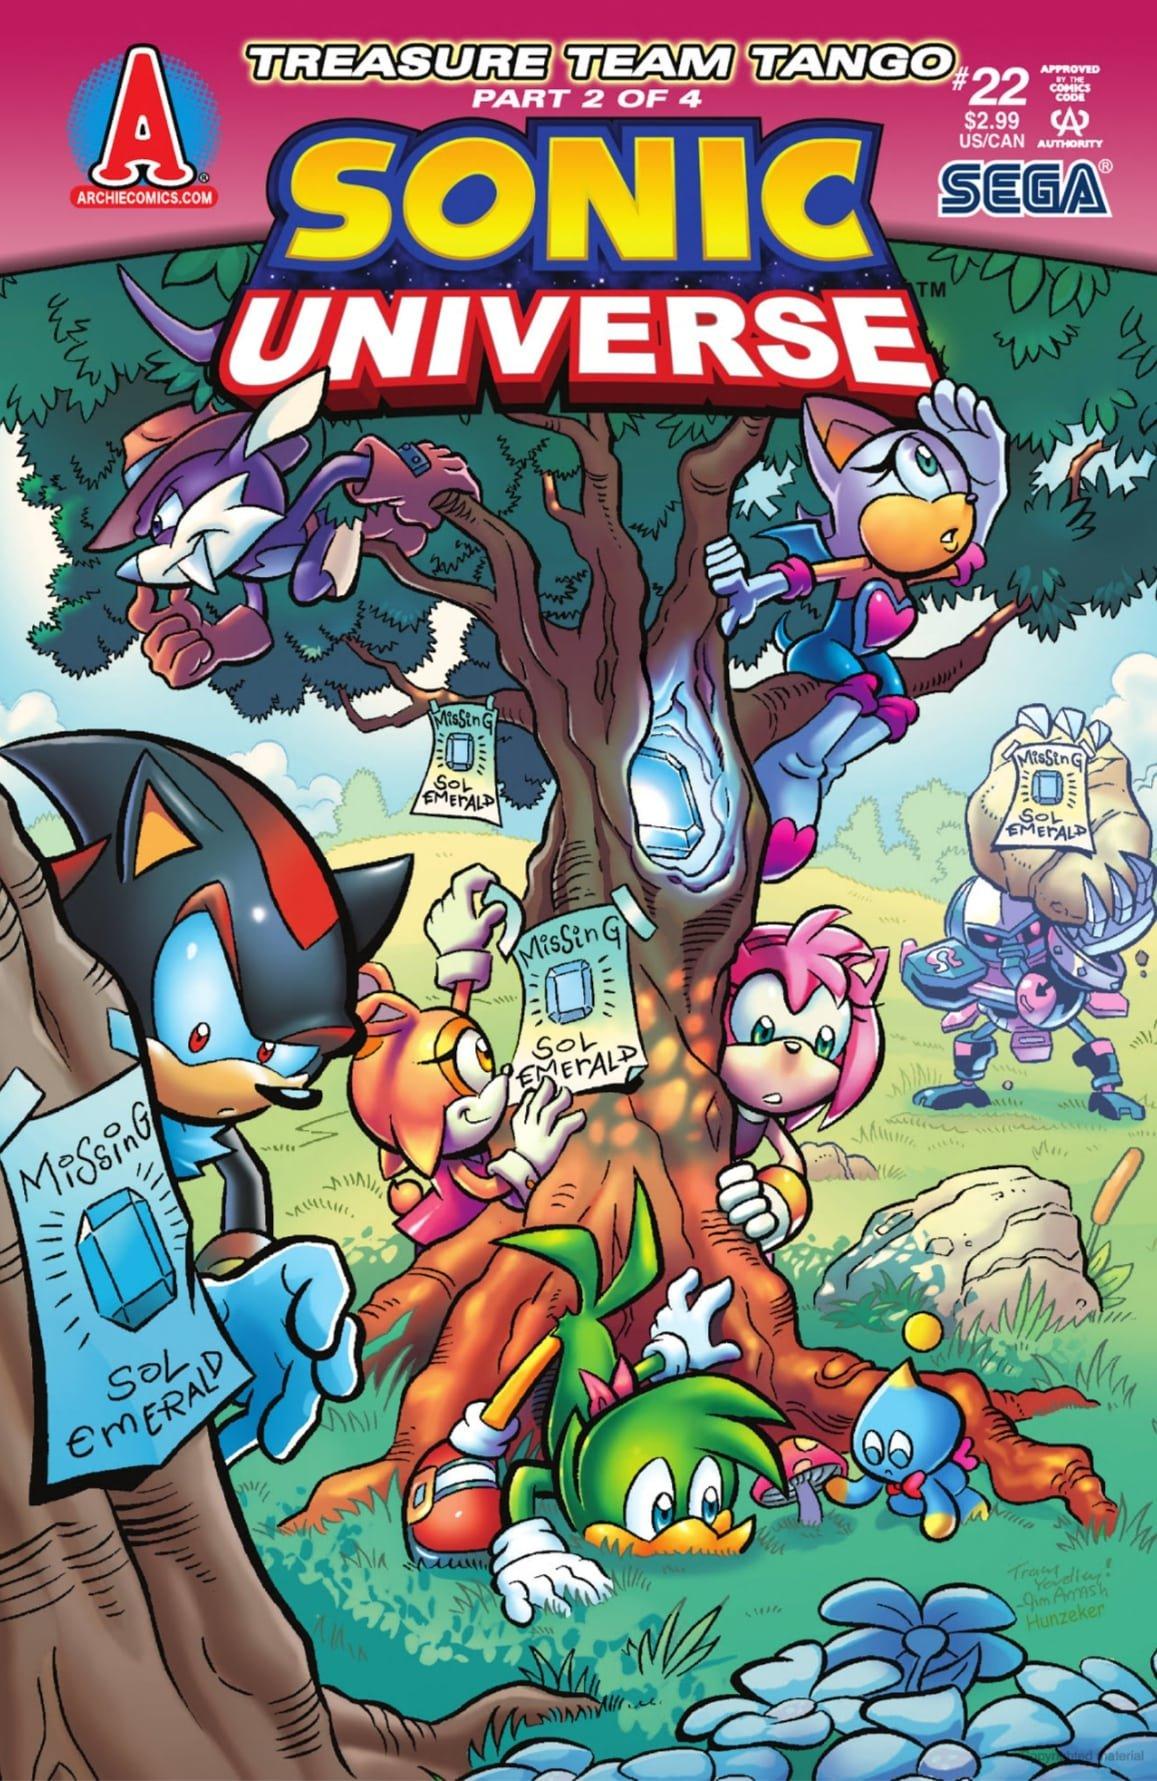 Sonic Universe 022 (January 2011)